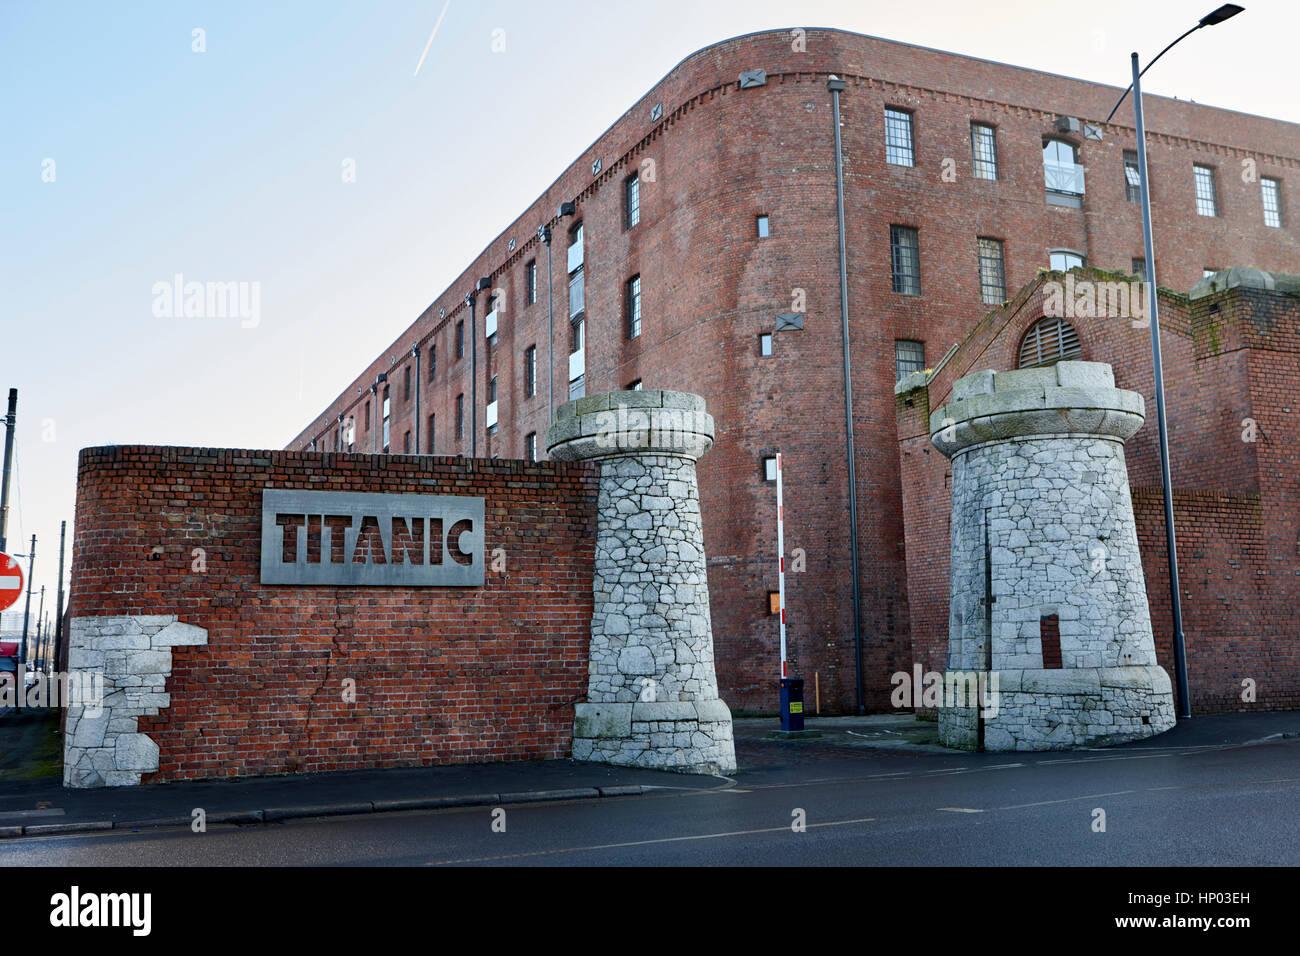 titanic hotel stanley dock liverpool uk Stock Photo